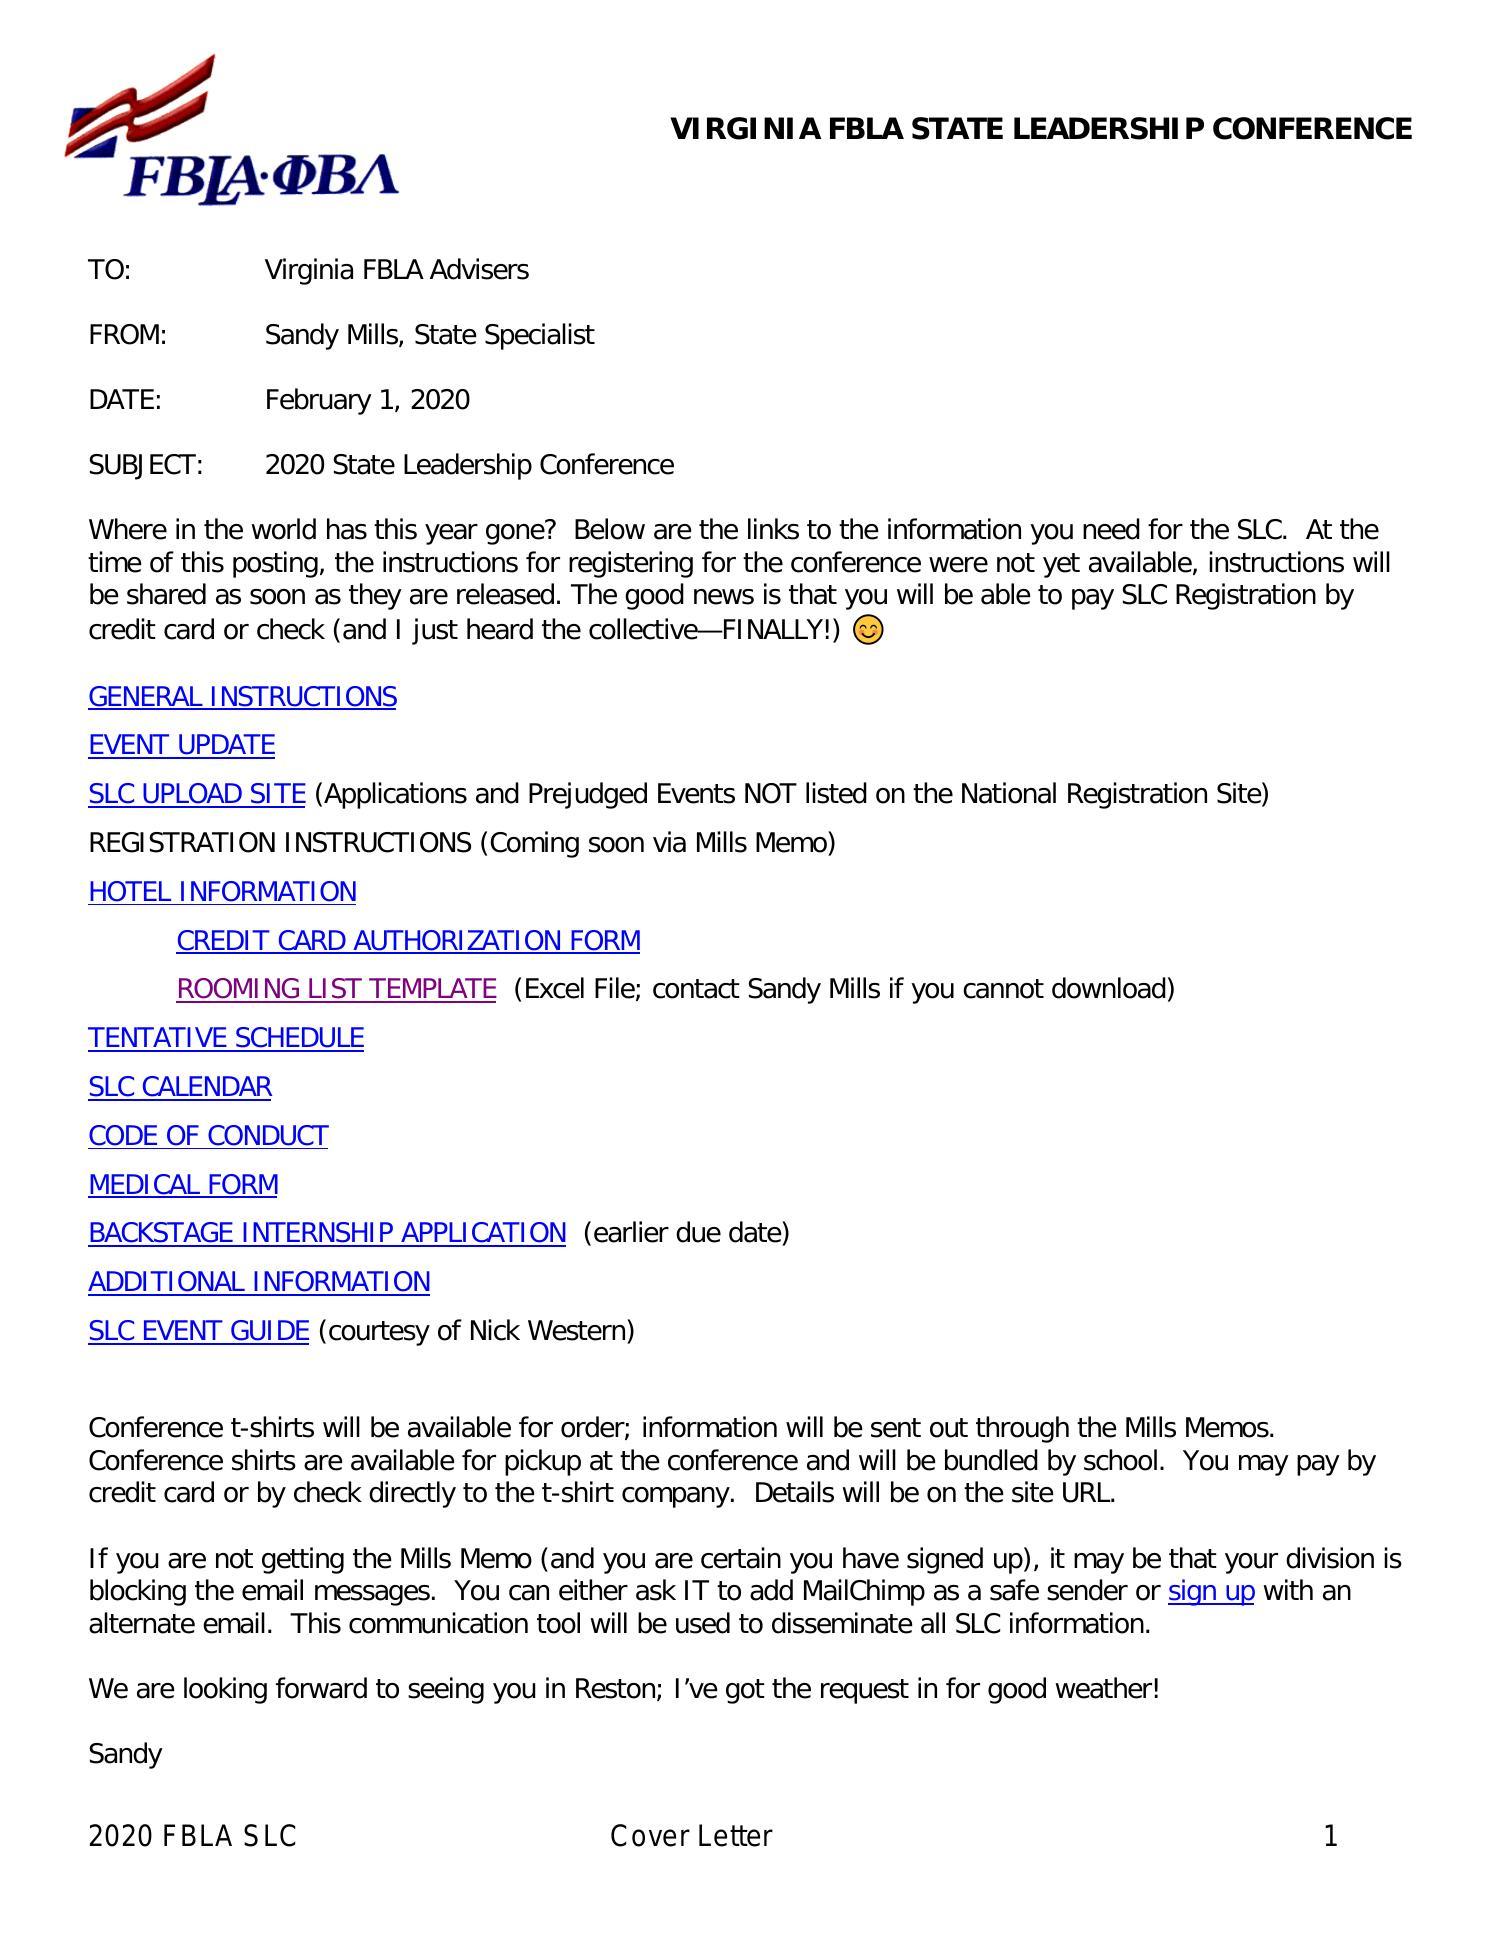 Cover Letter 2020.pdf   DocDroid